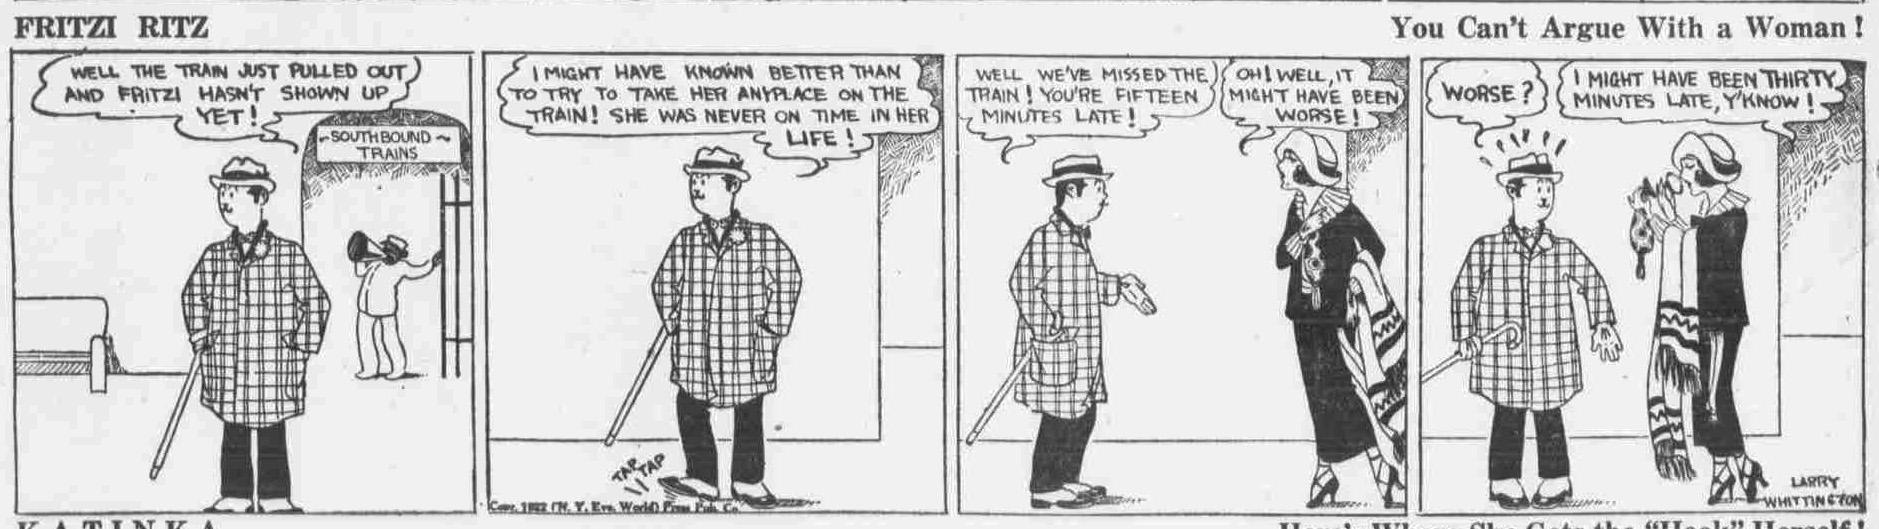 Dec. 8, 1922